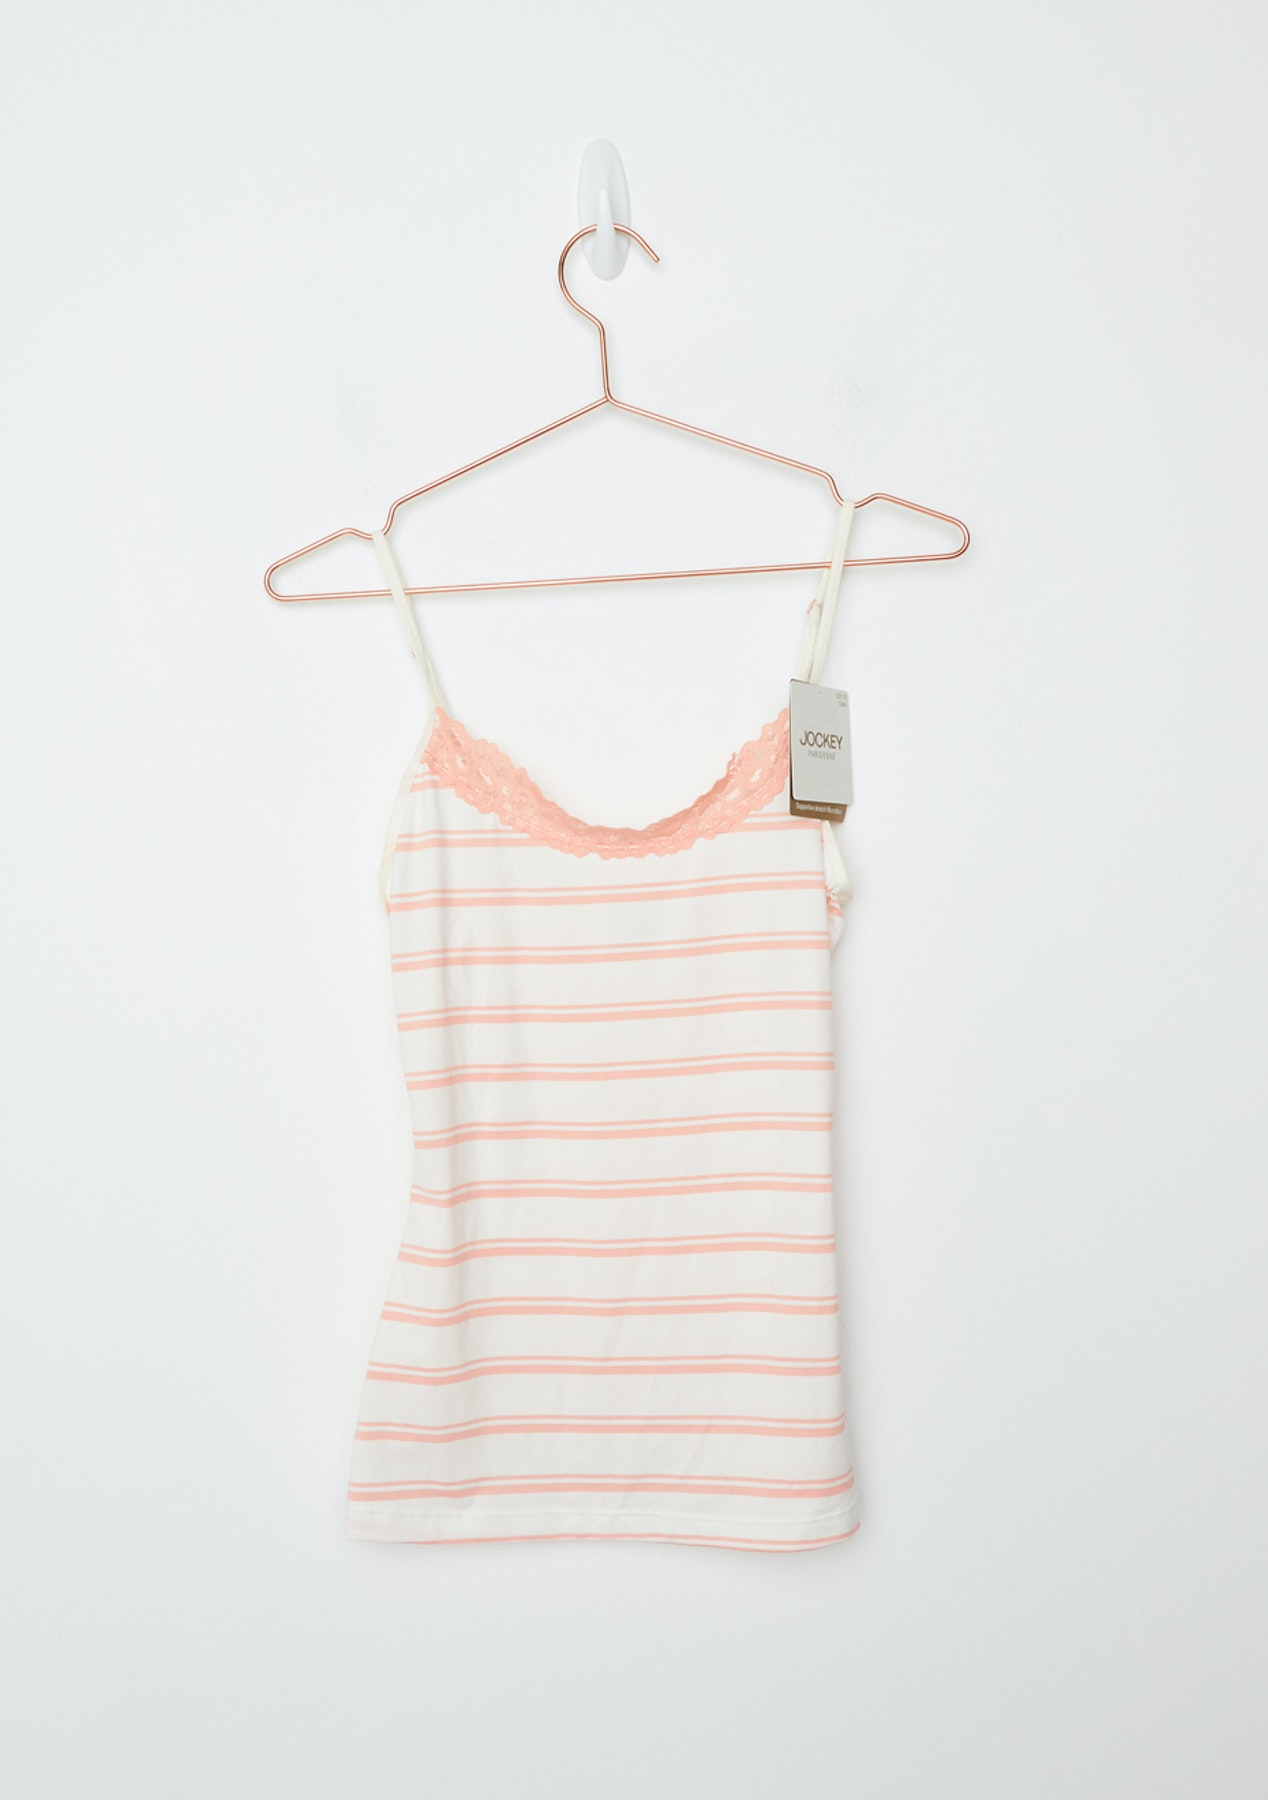 Womens Shirts And Blouses Under $10 | Azərbaycan Dillər